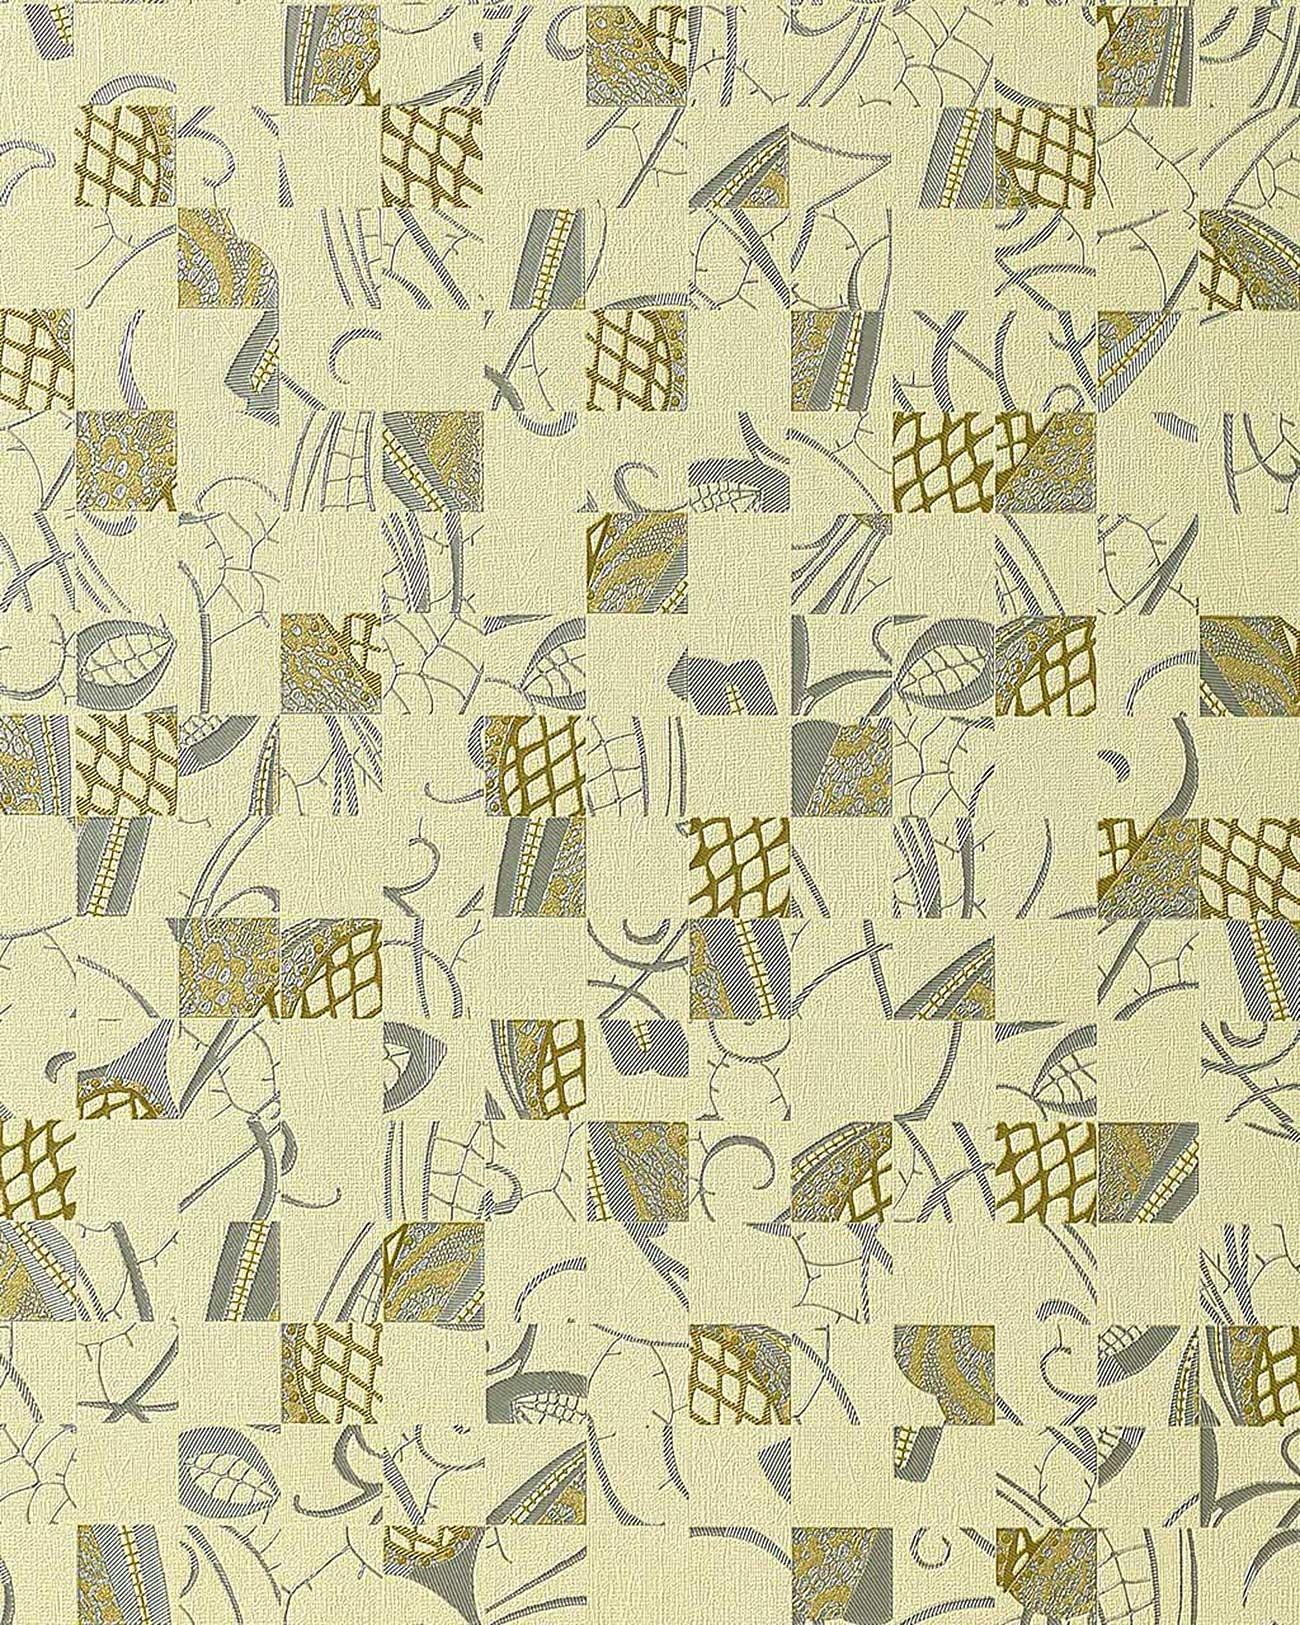 stein tapete edem 745 28 tapete mystic arts collage abstraktes mosaik muster hochwertige prgequalitt - Mosaik Muster